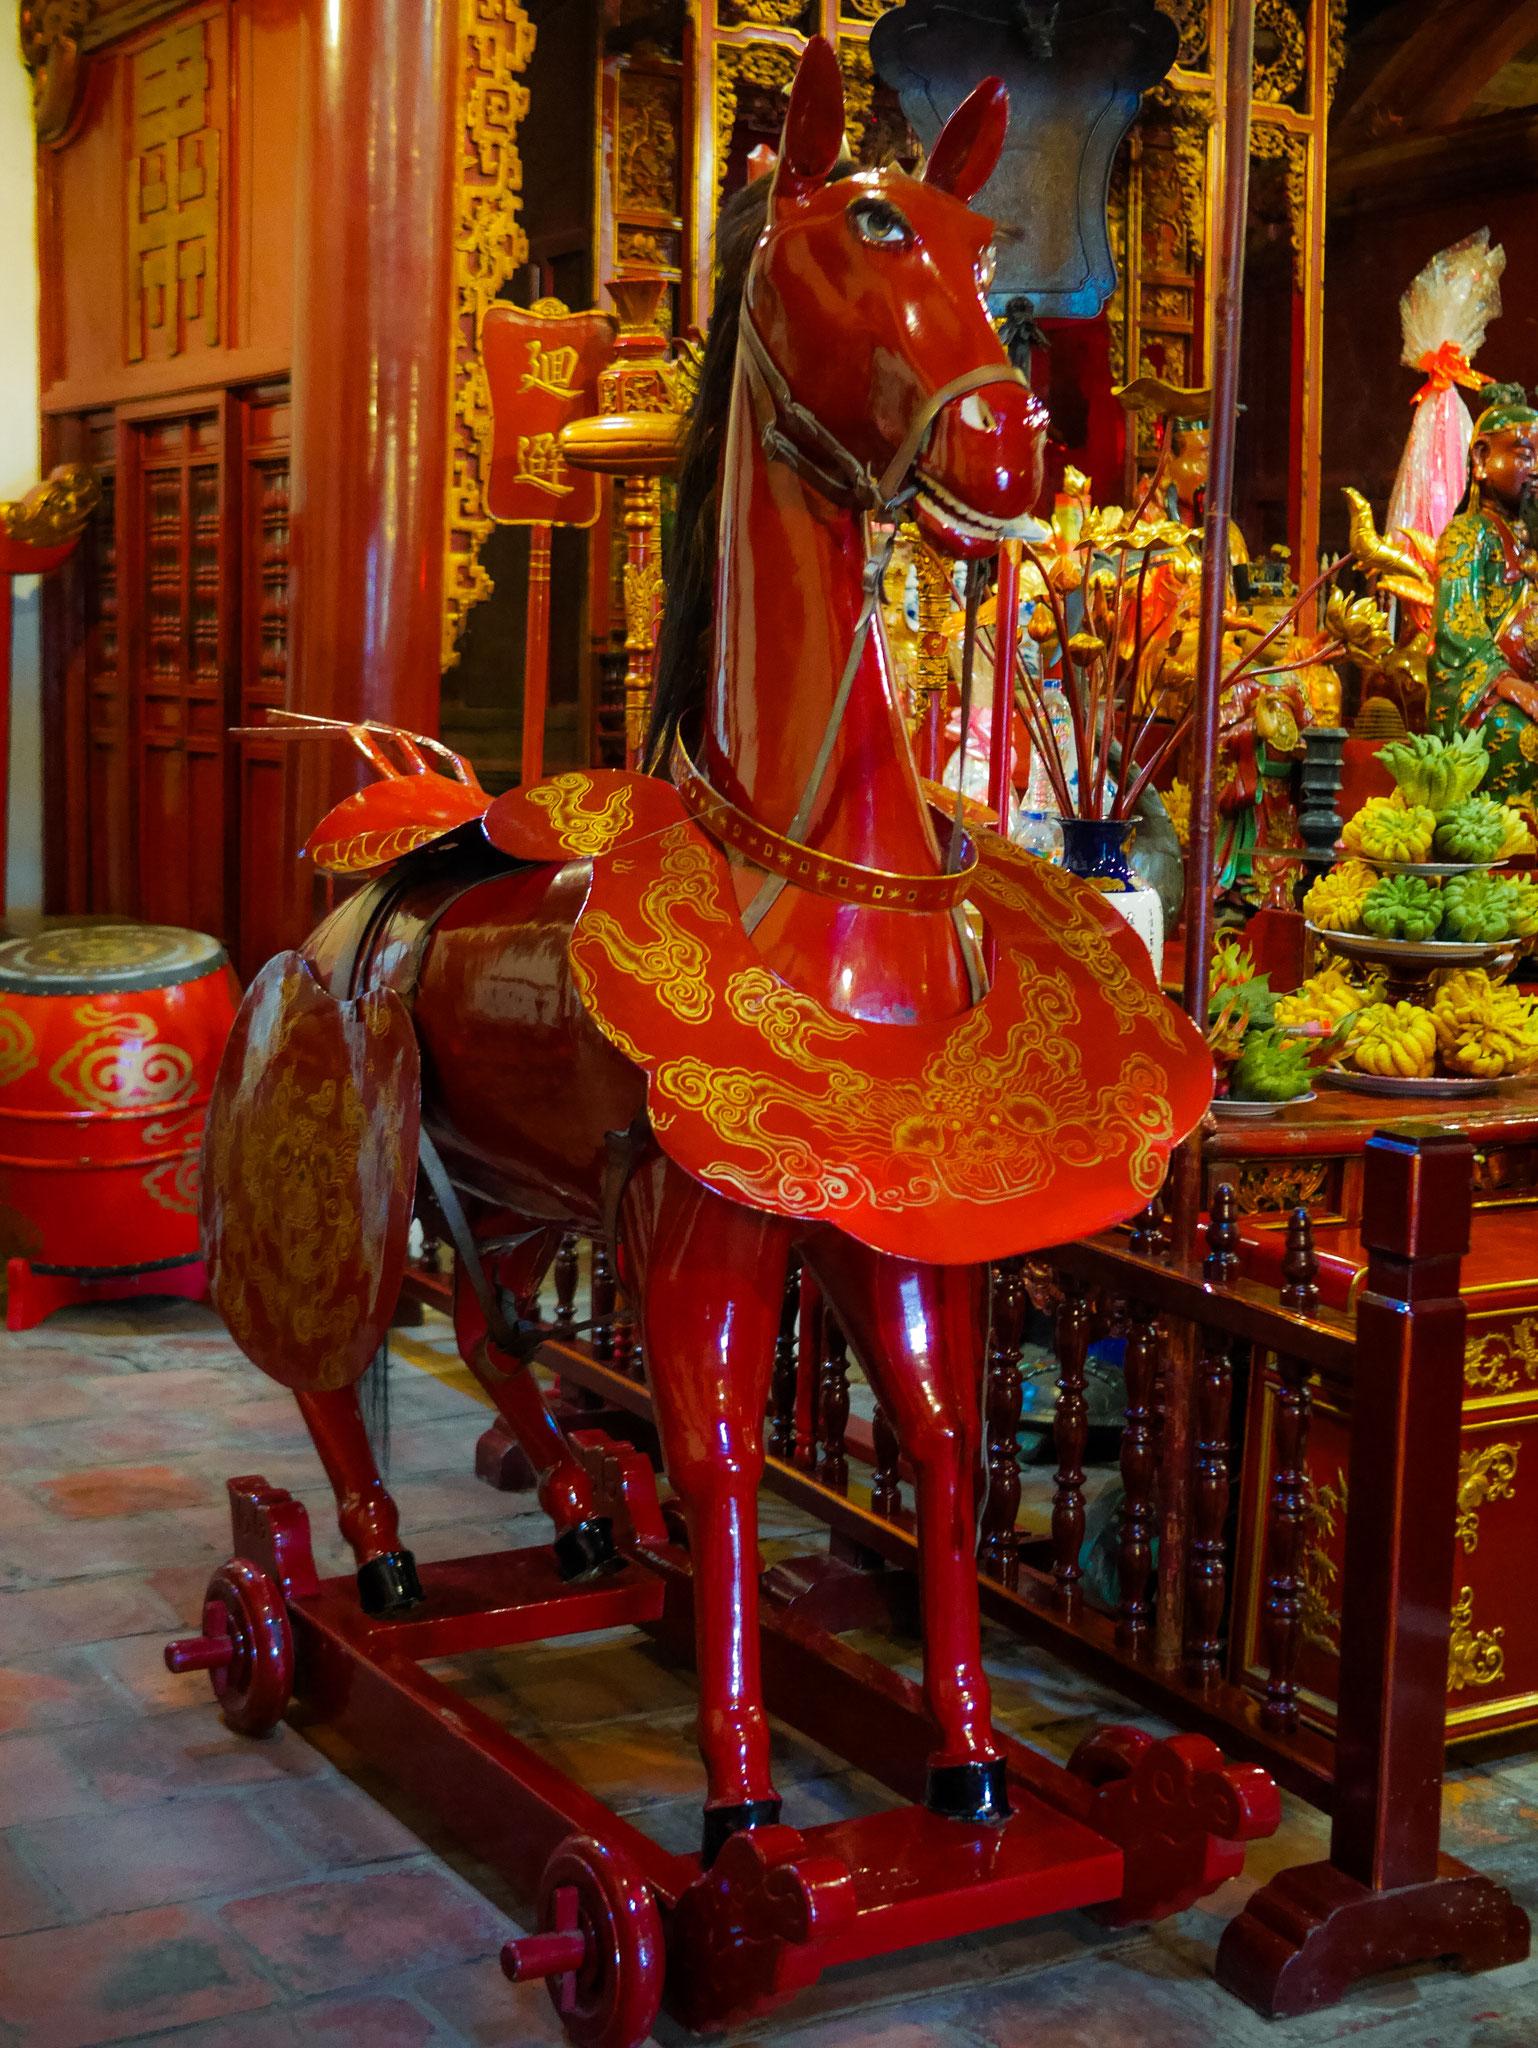 Hanoi - Ngoc Son Temple